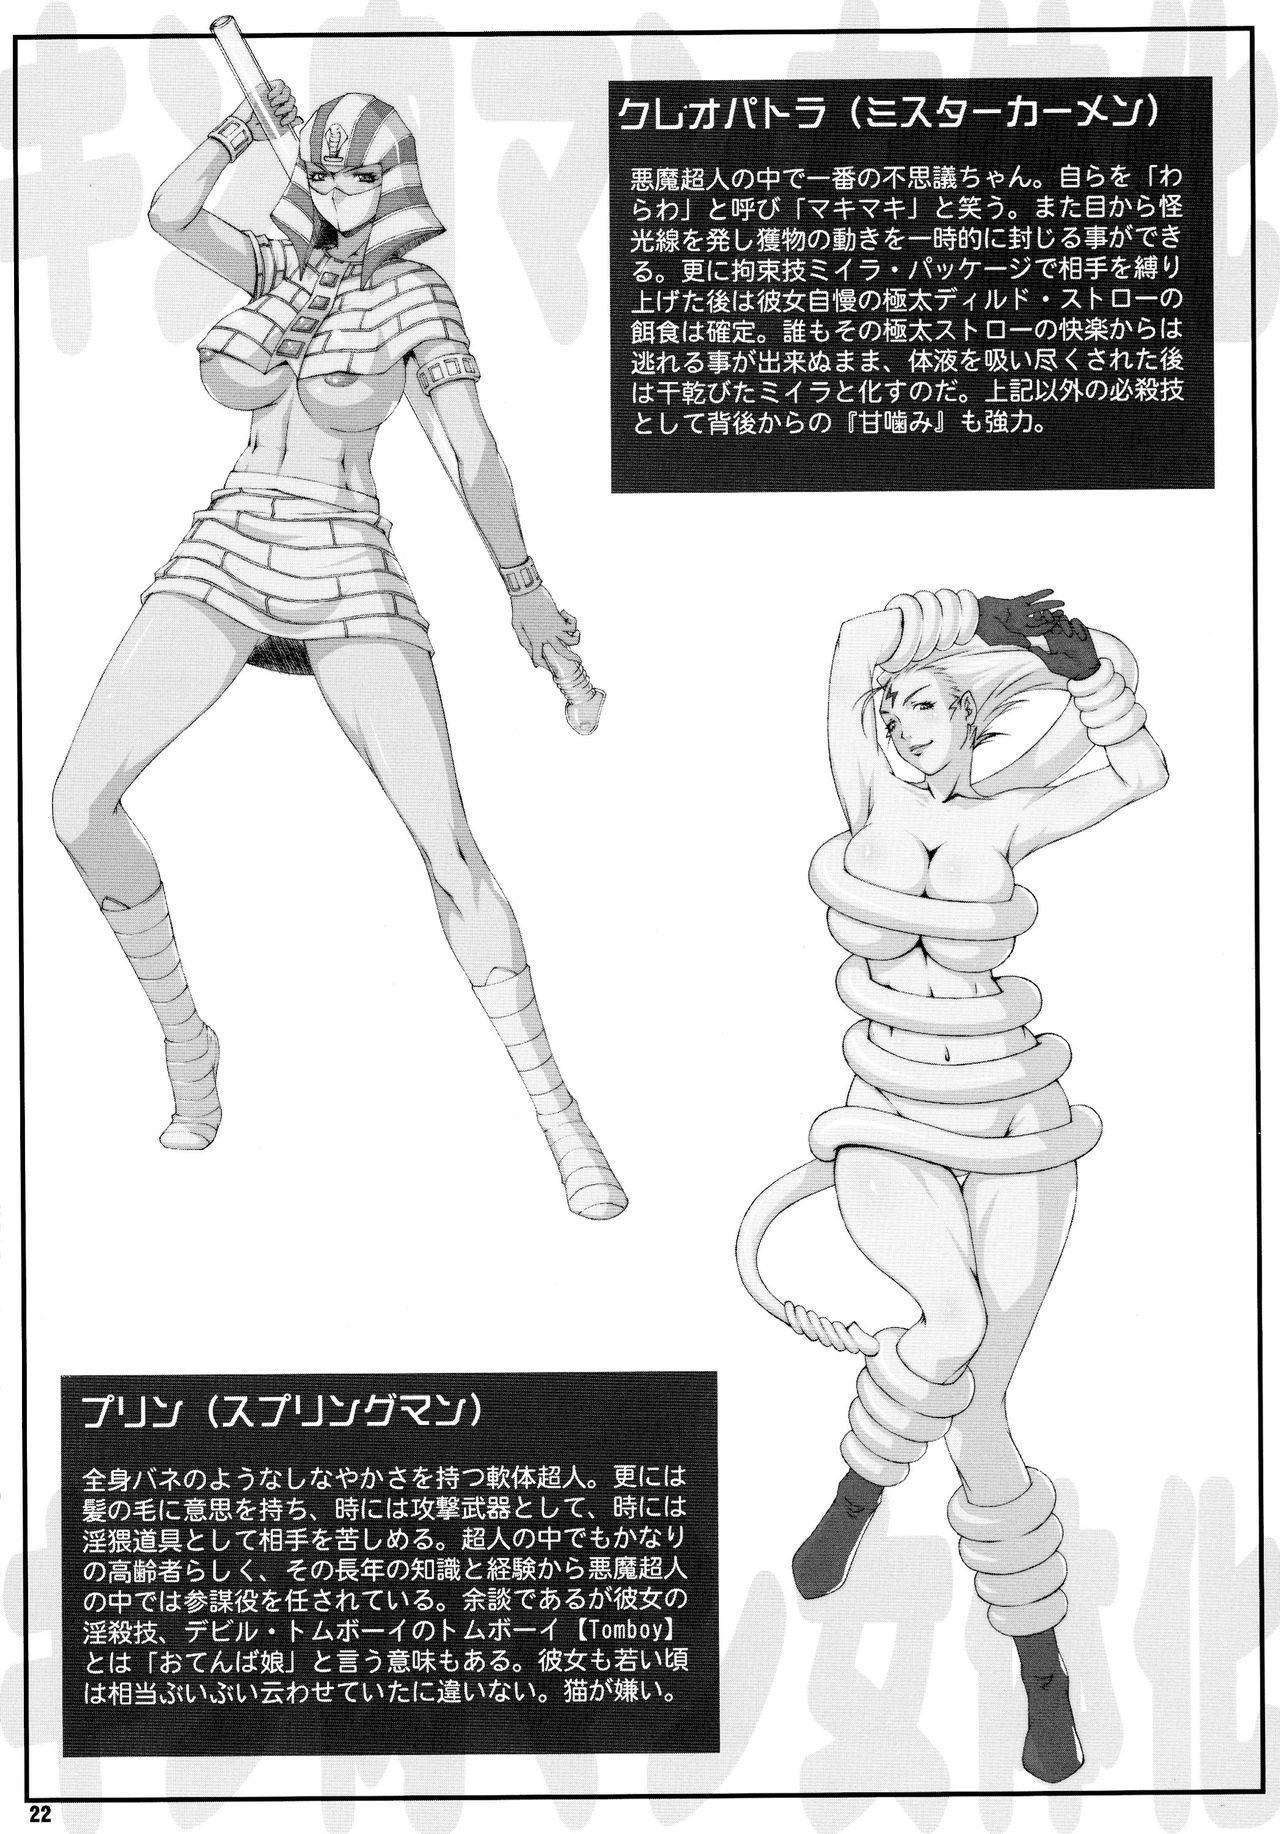 Misoka no 5 21